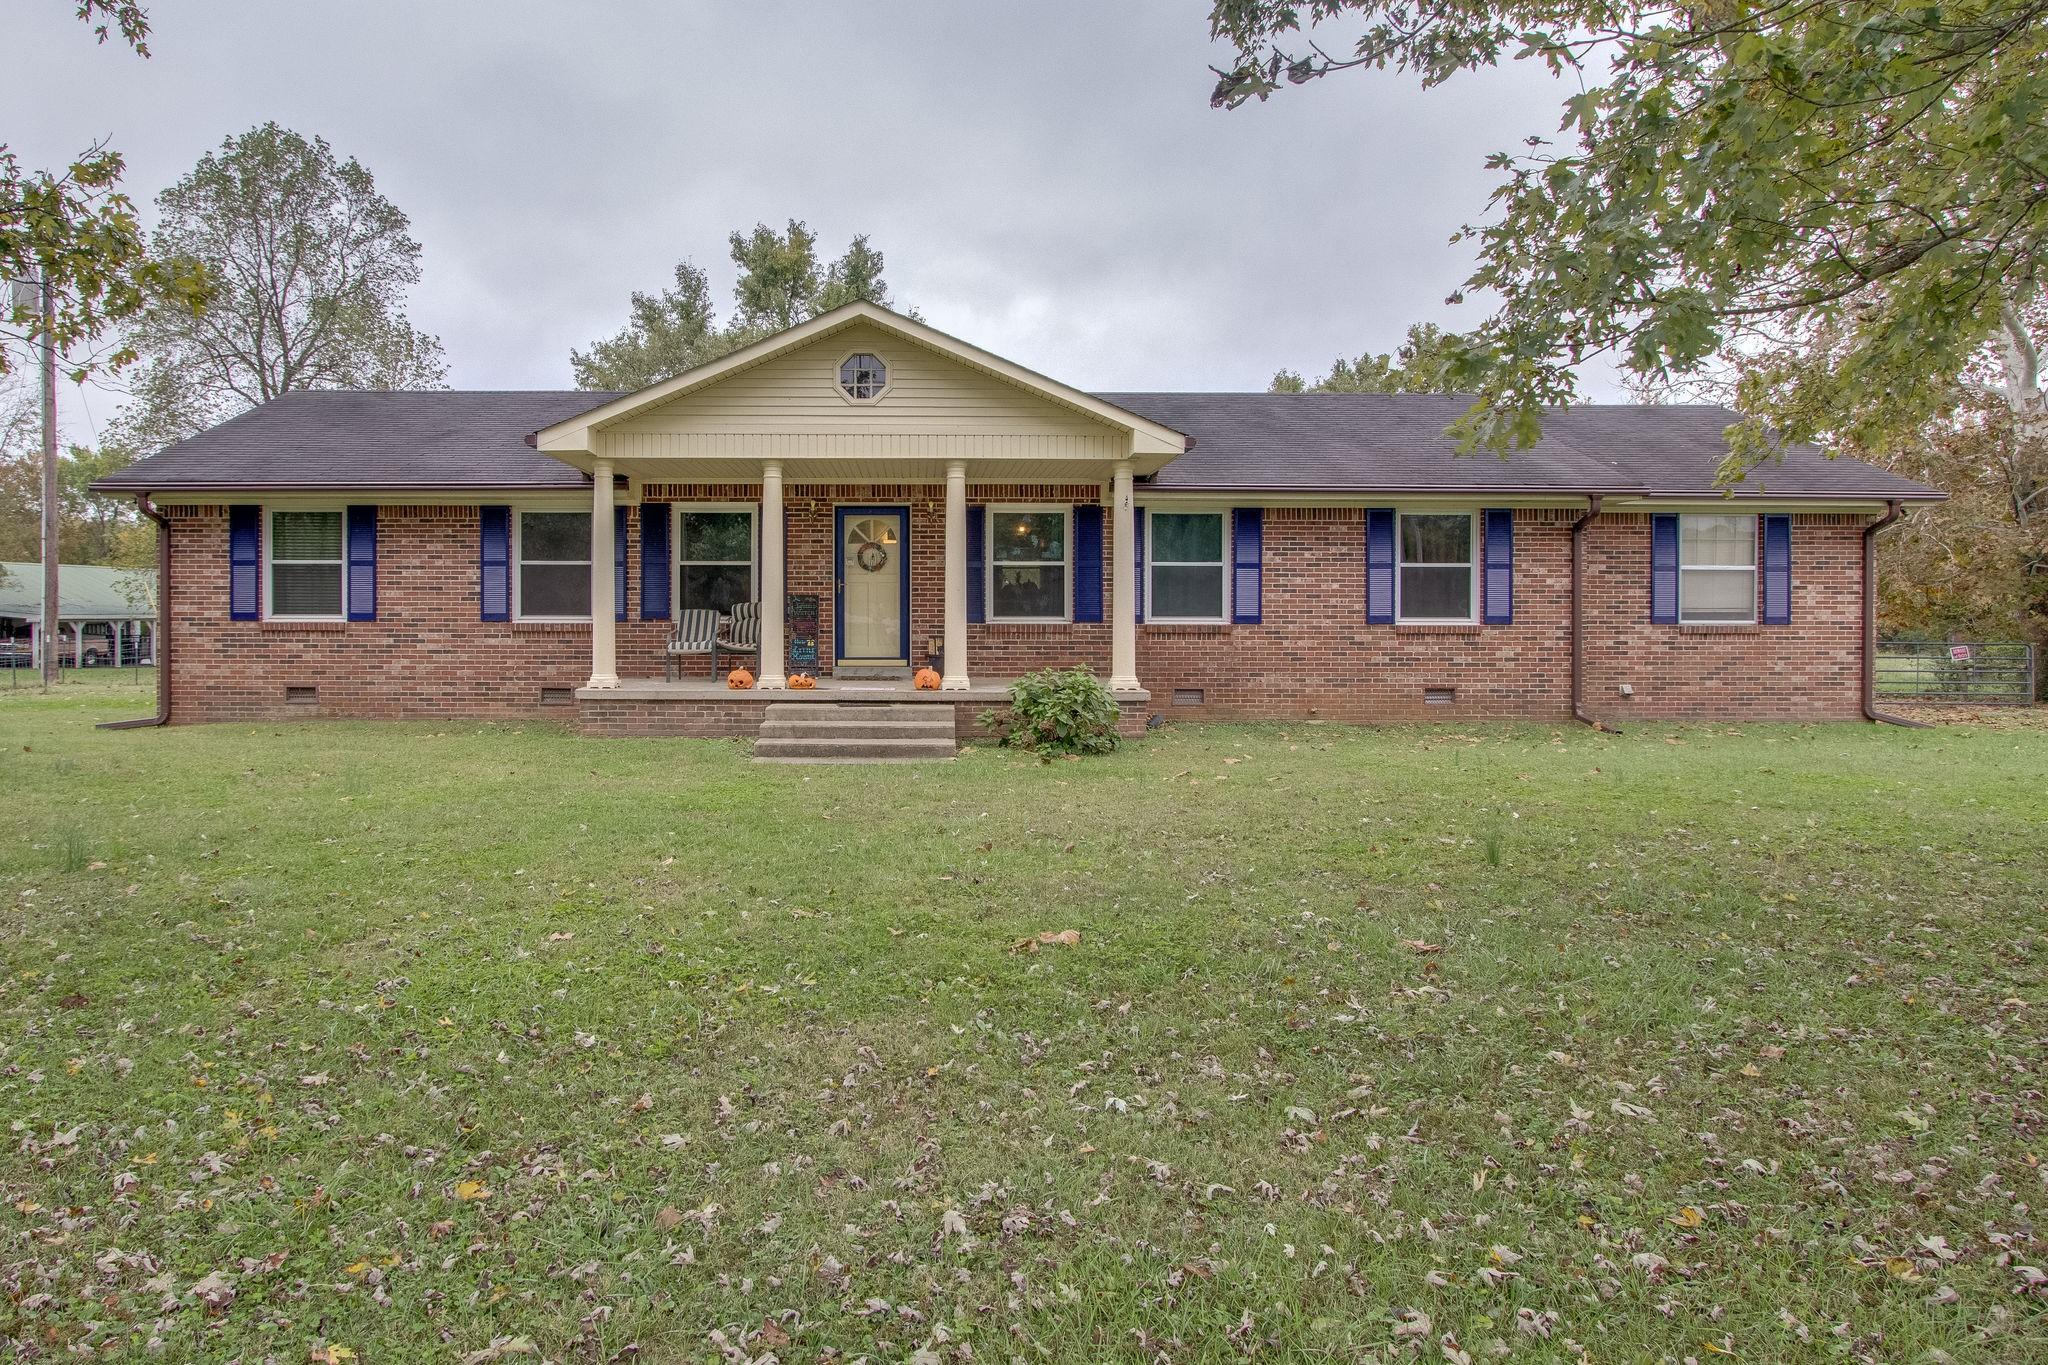 3112 Hartsville Pike, Castalian Springs, TN 37031 - Castalian Springs, TN real estate listing